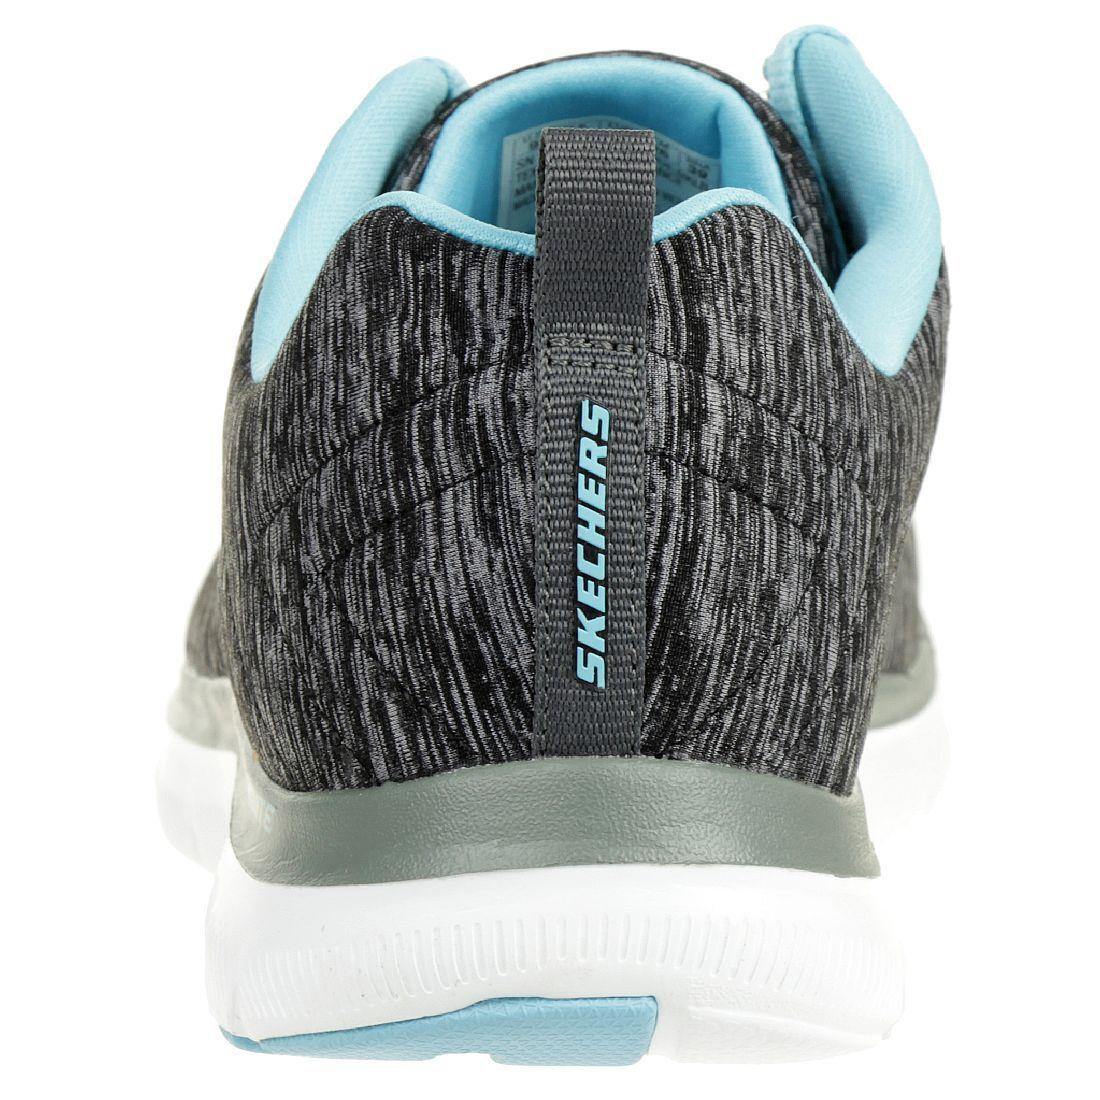 Skechers Skechers Skechers Flex Appeal 2.0 donna Fitness Scarpe Leggero Nero 000681